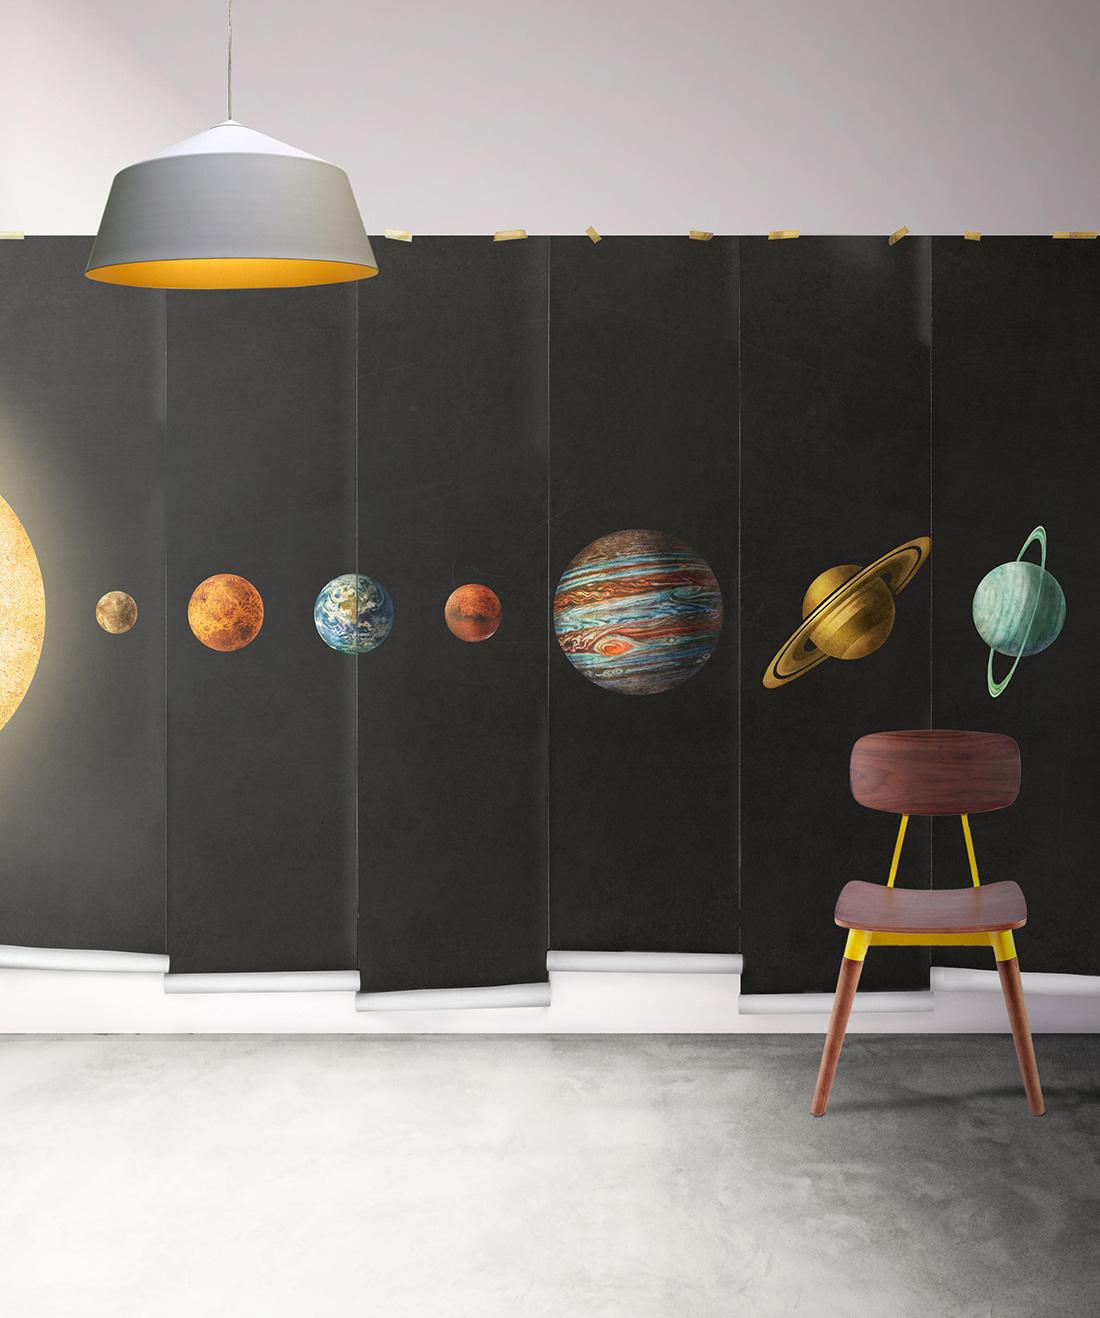 solar system • Space Wallpaper • Planet Wallpaper • Milton & King USA